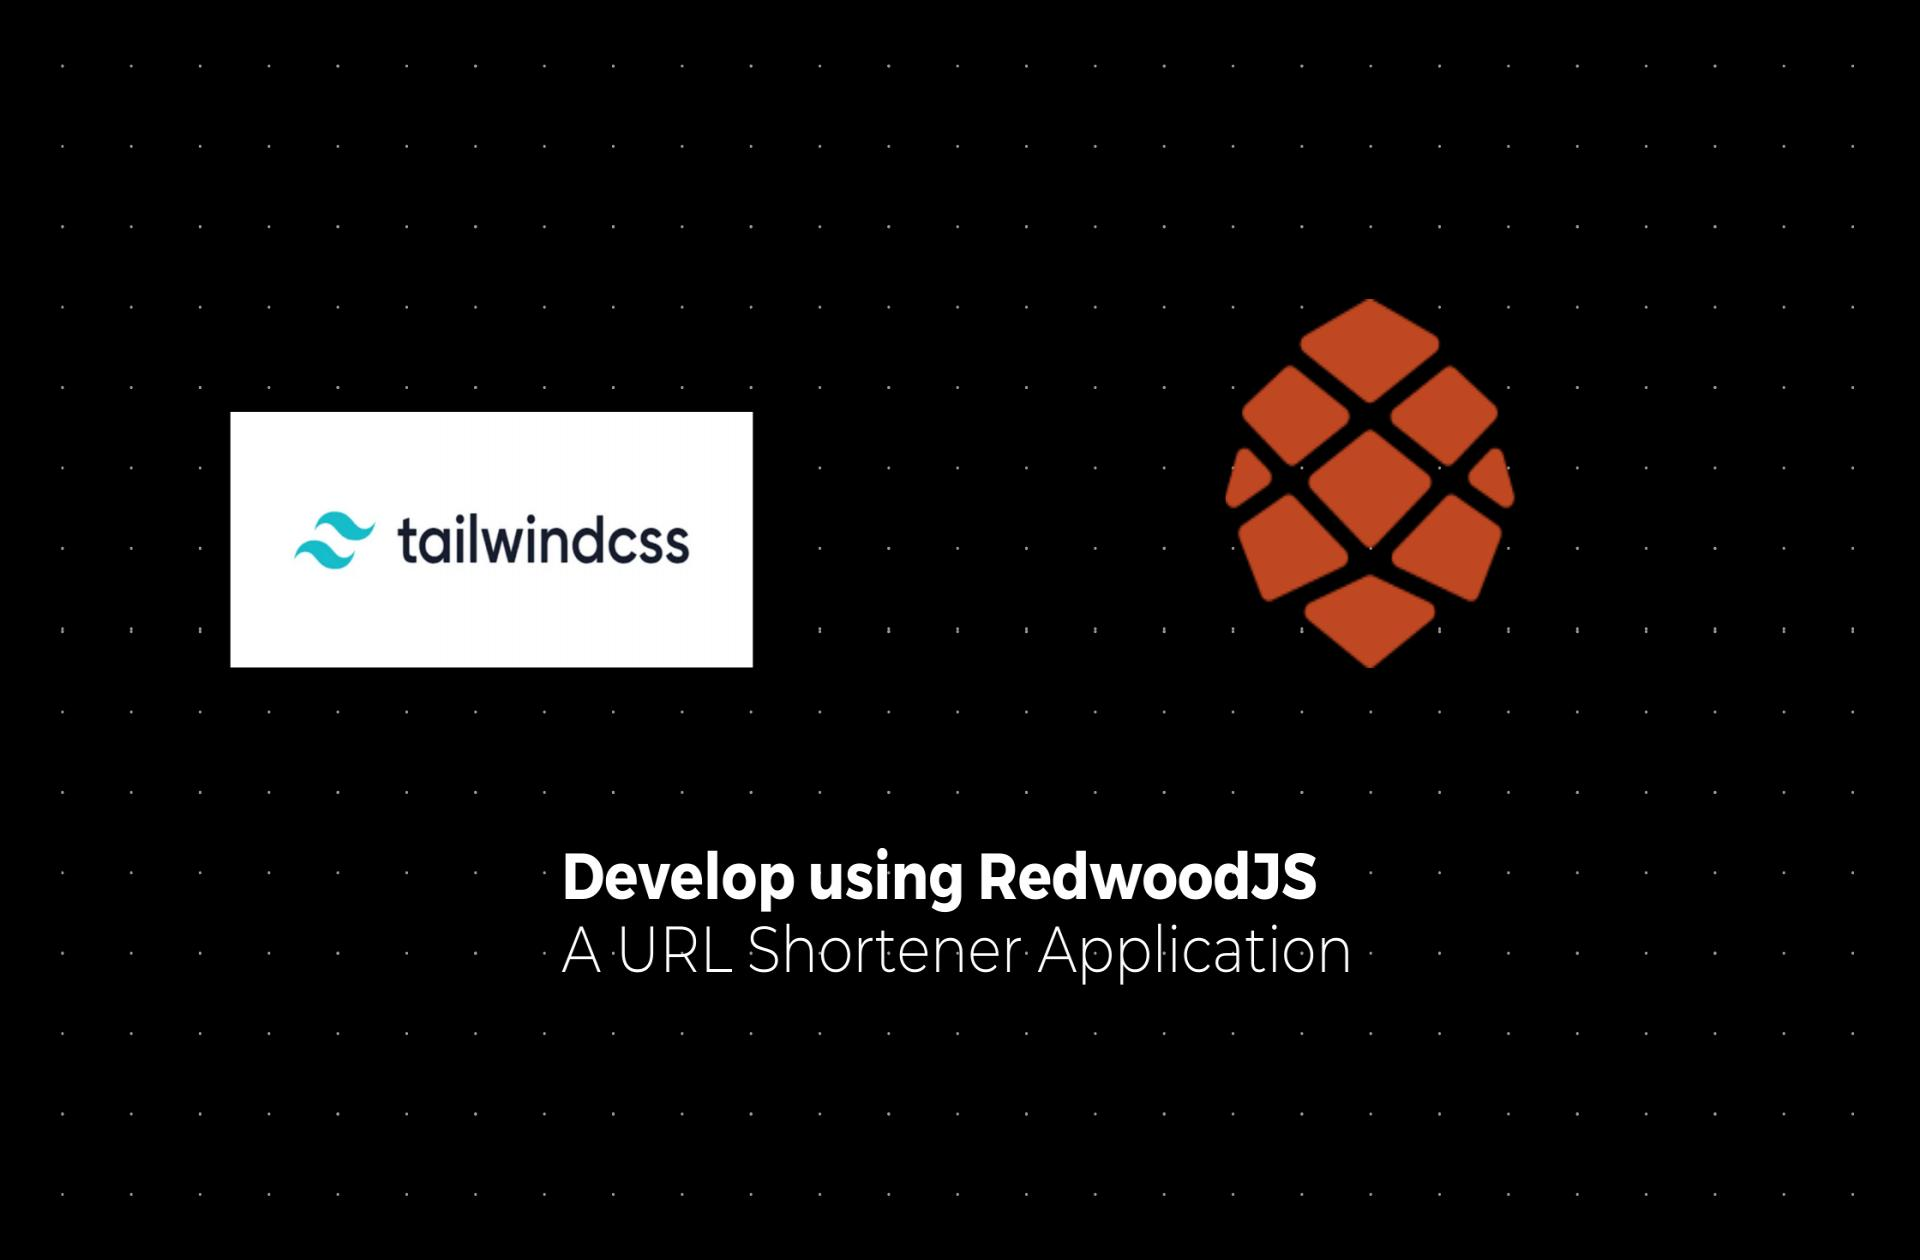 Develop a RedwoodJS URL shortener application